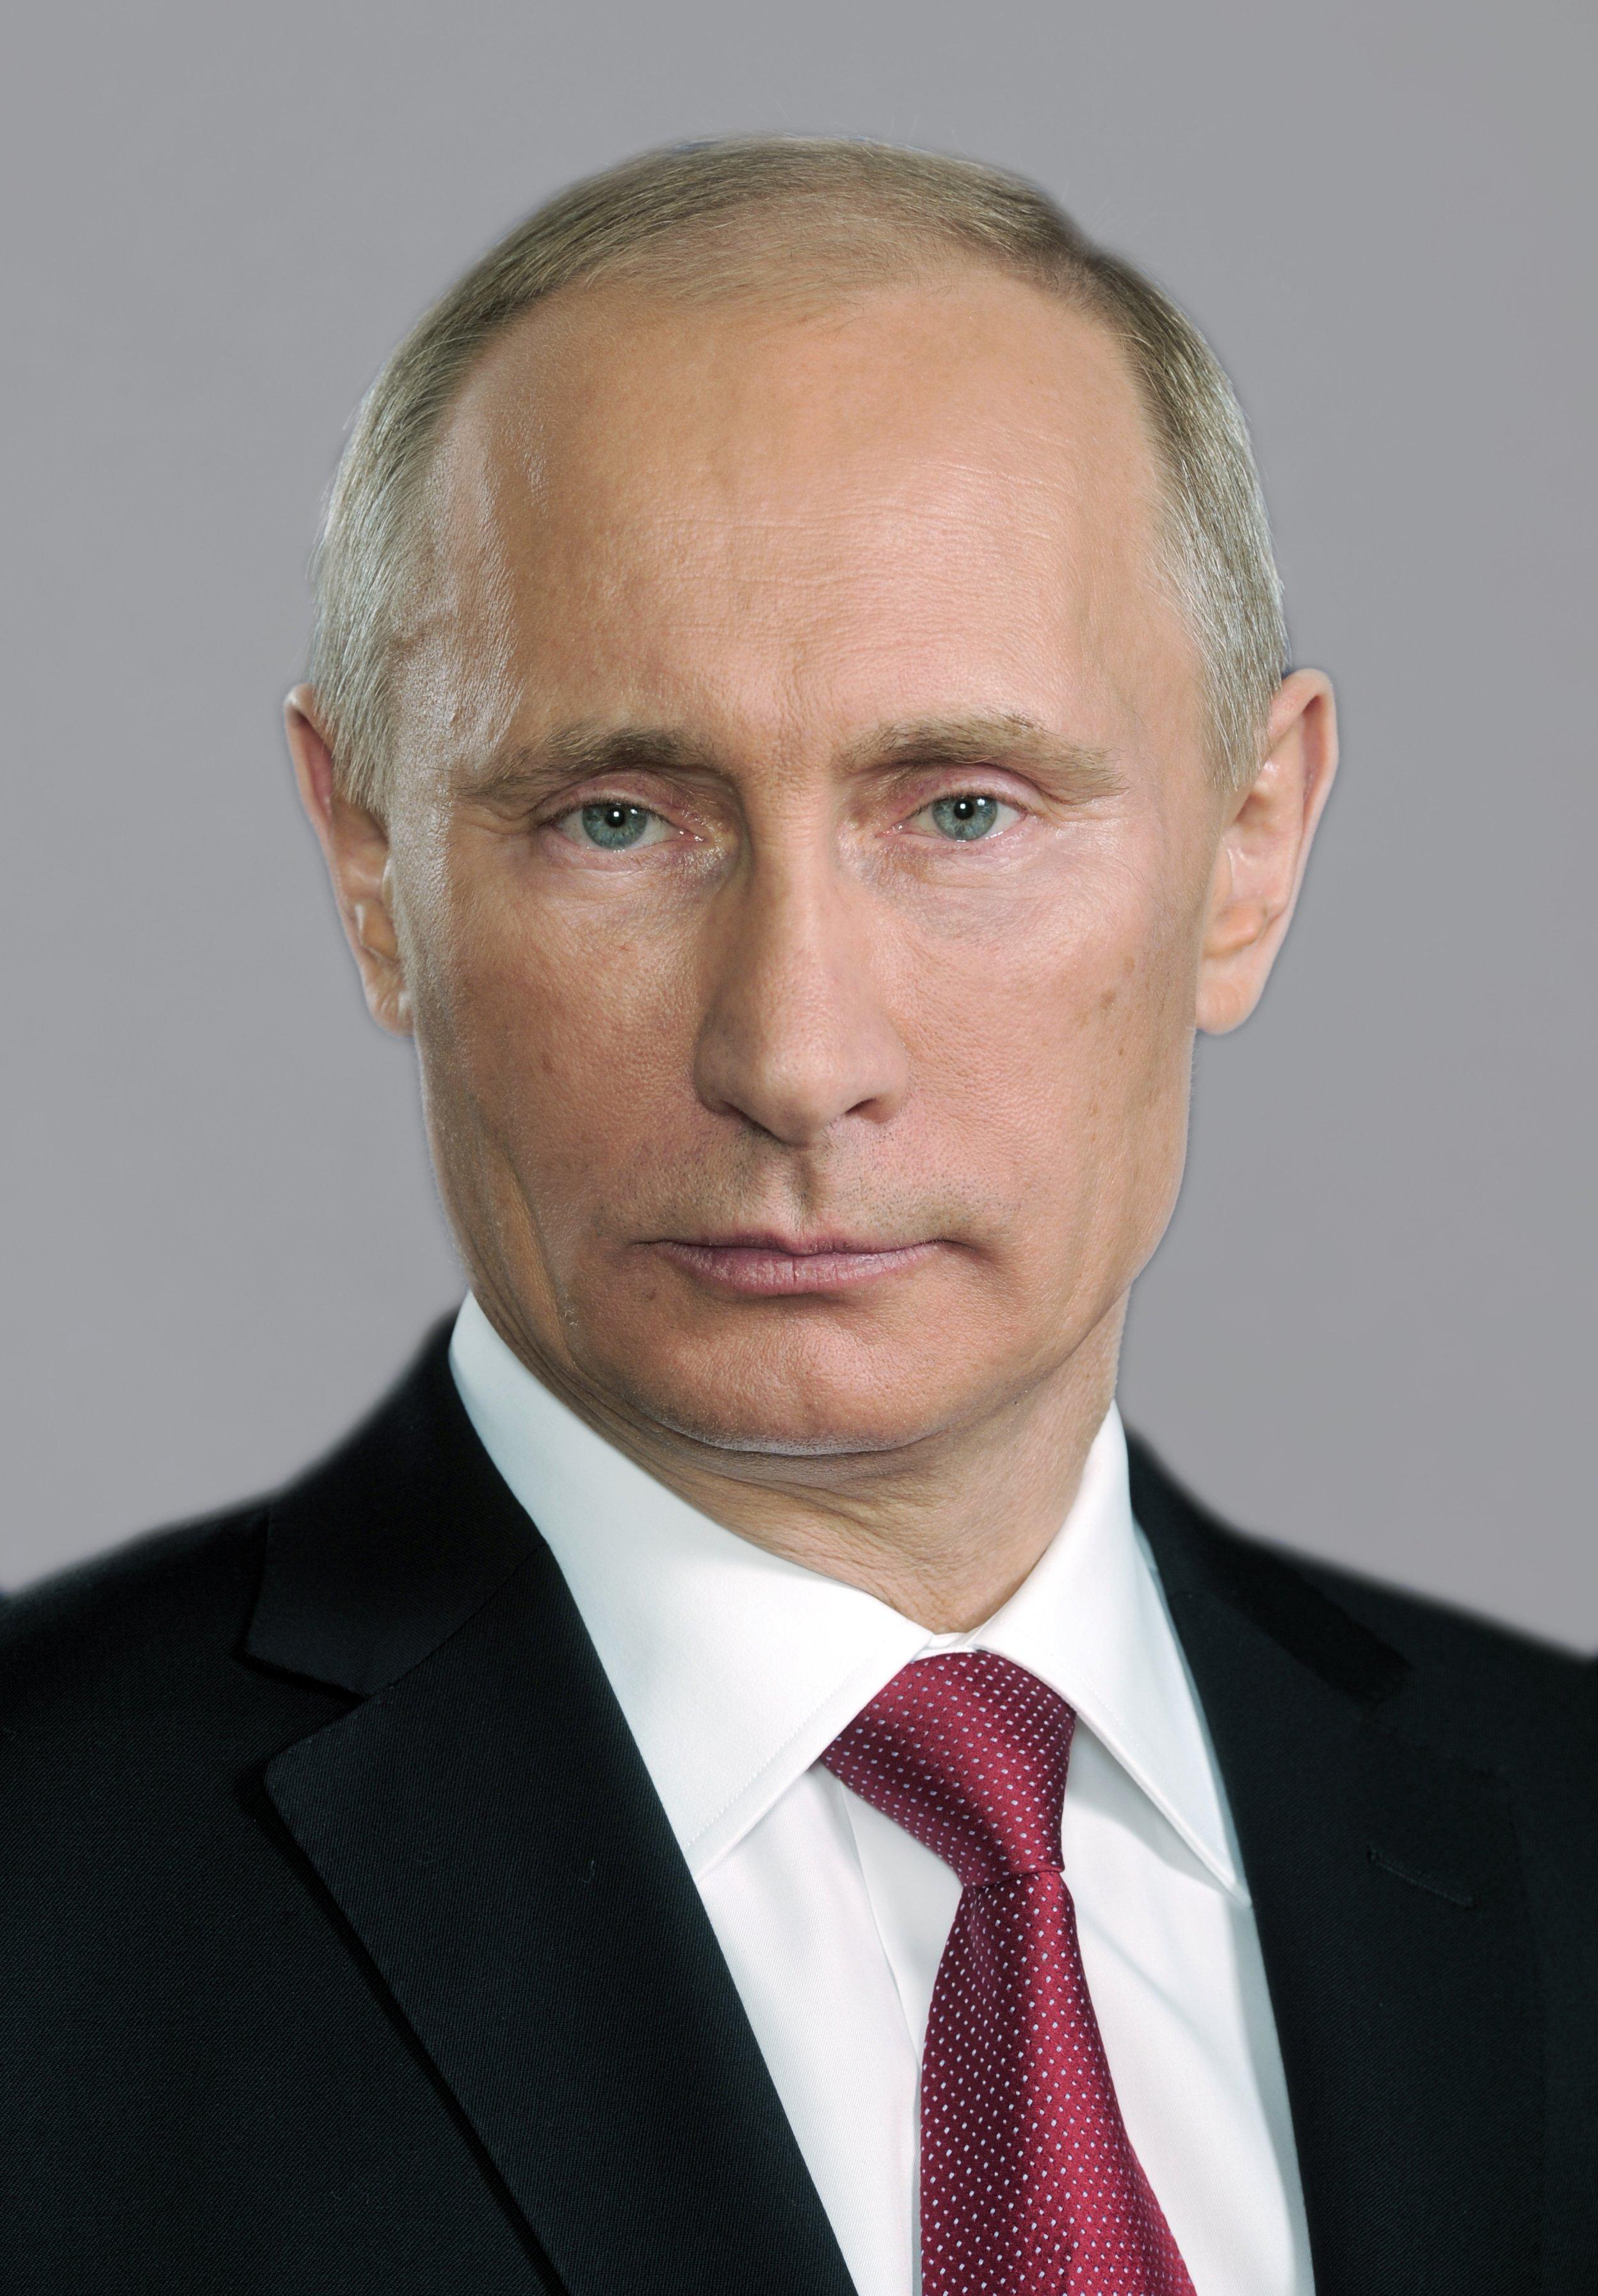 Vladimir Putin official